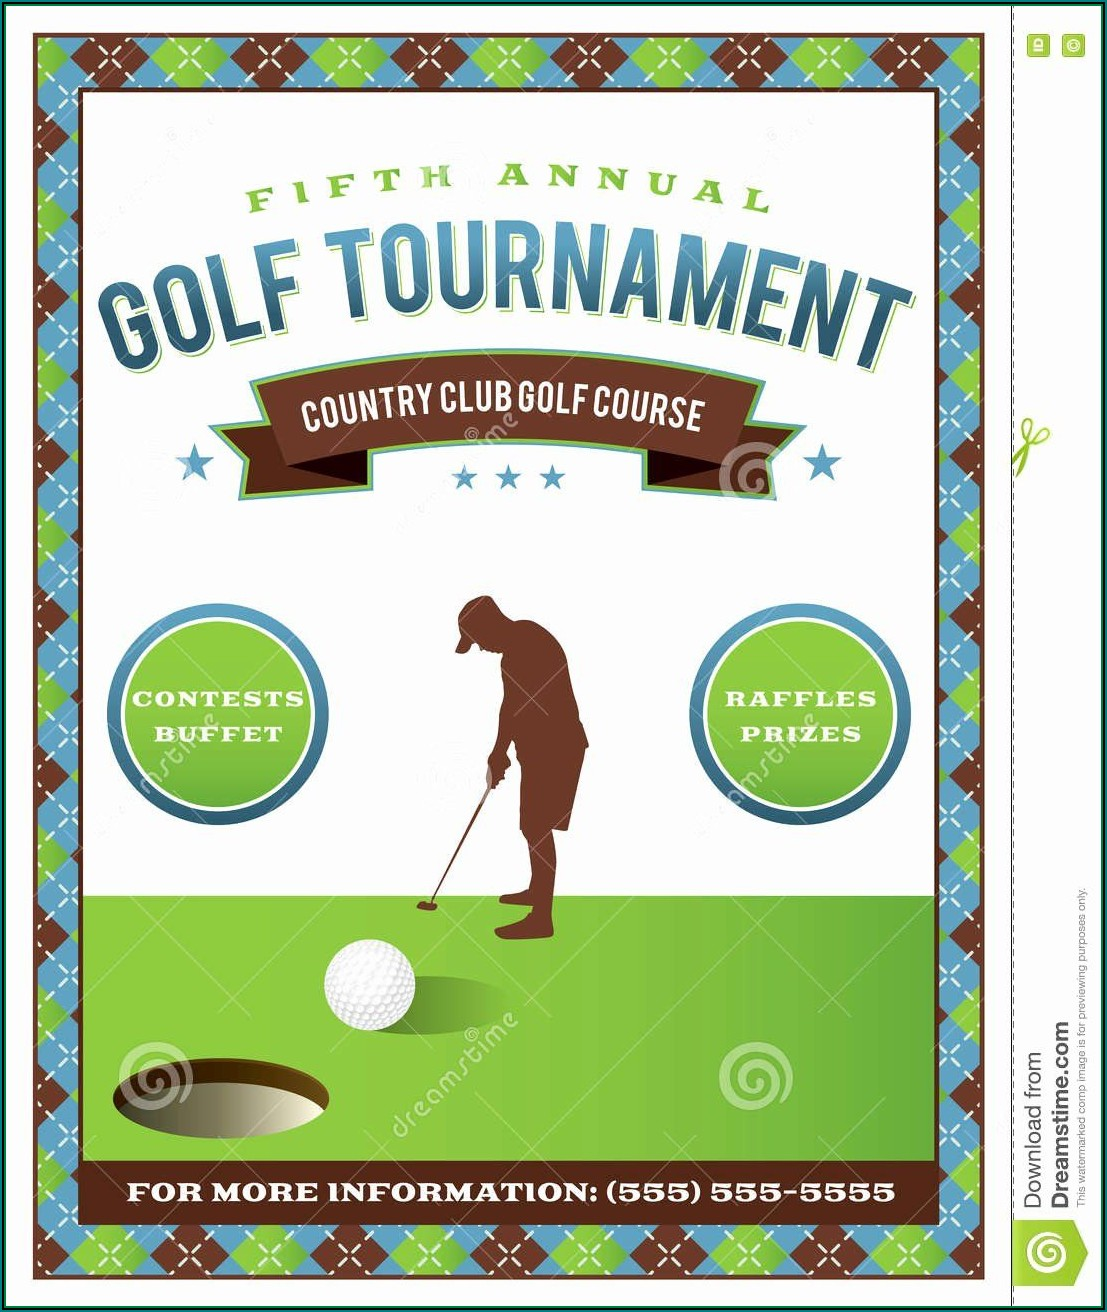 Golf Tournament Brochure Template Free